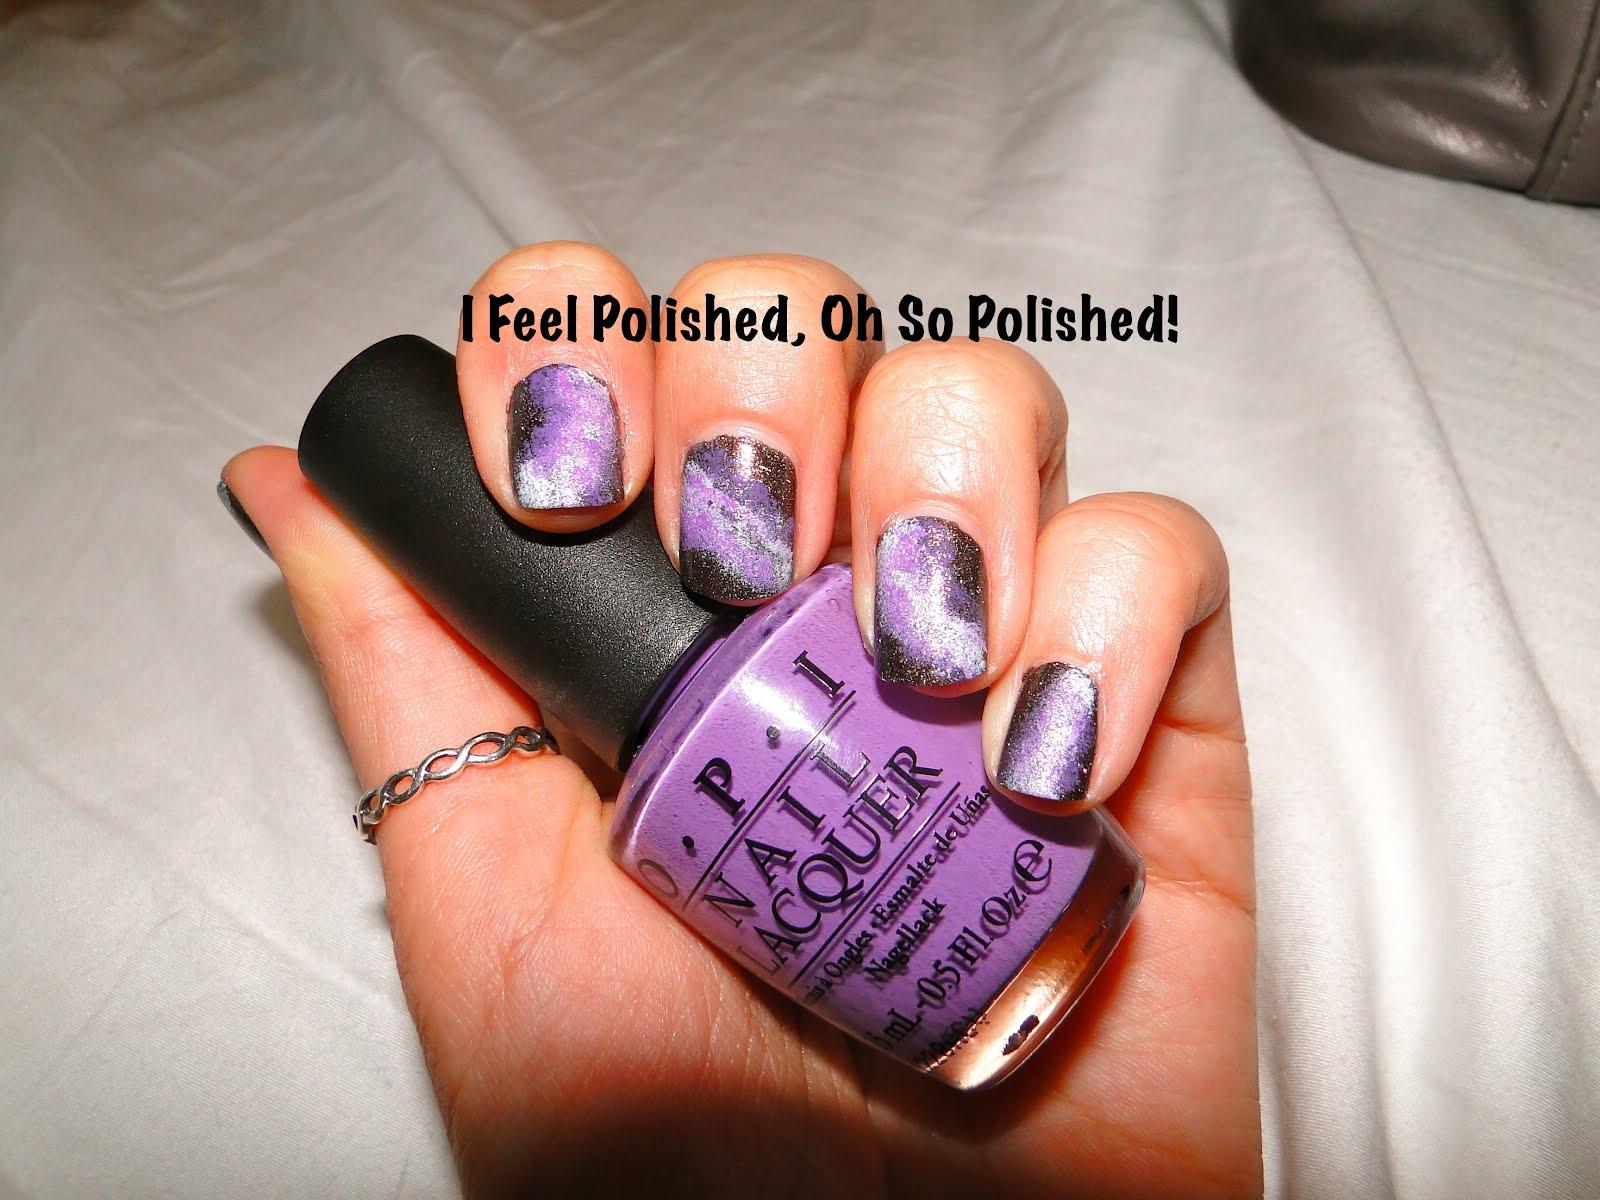 I Feel Polished!: March 2012